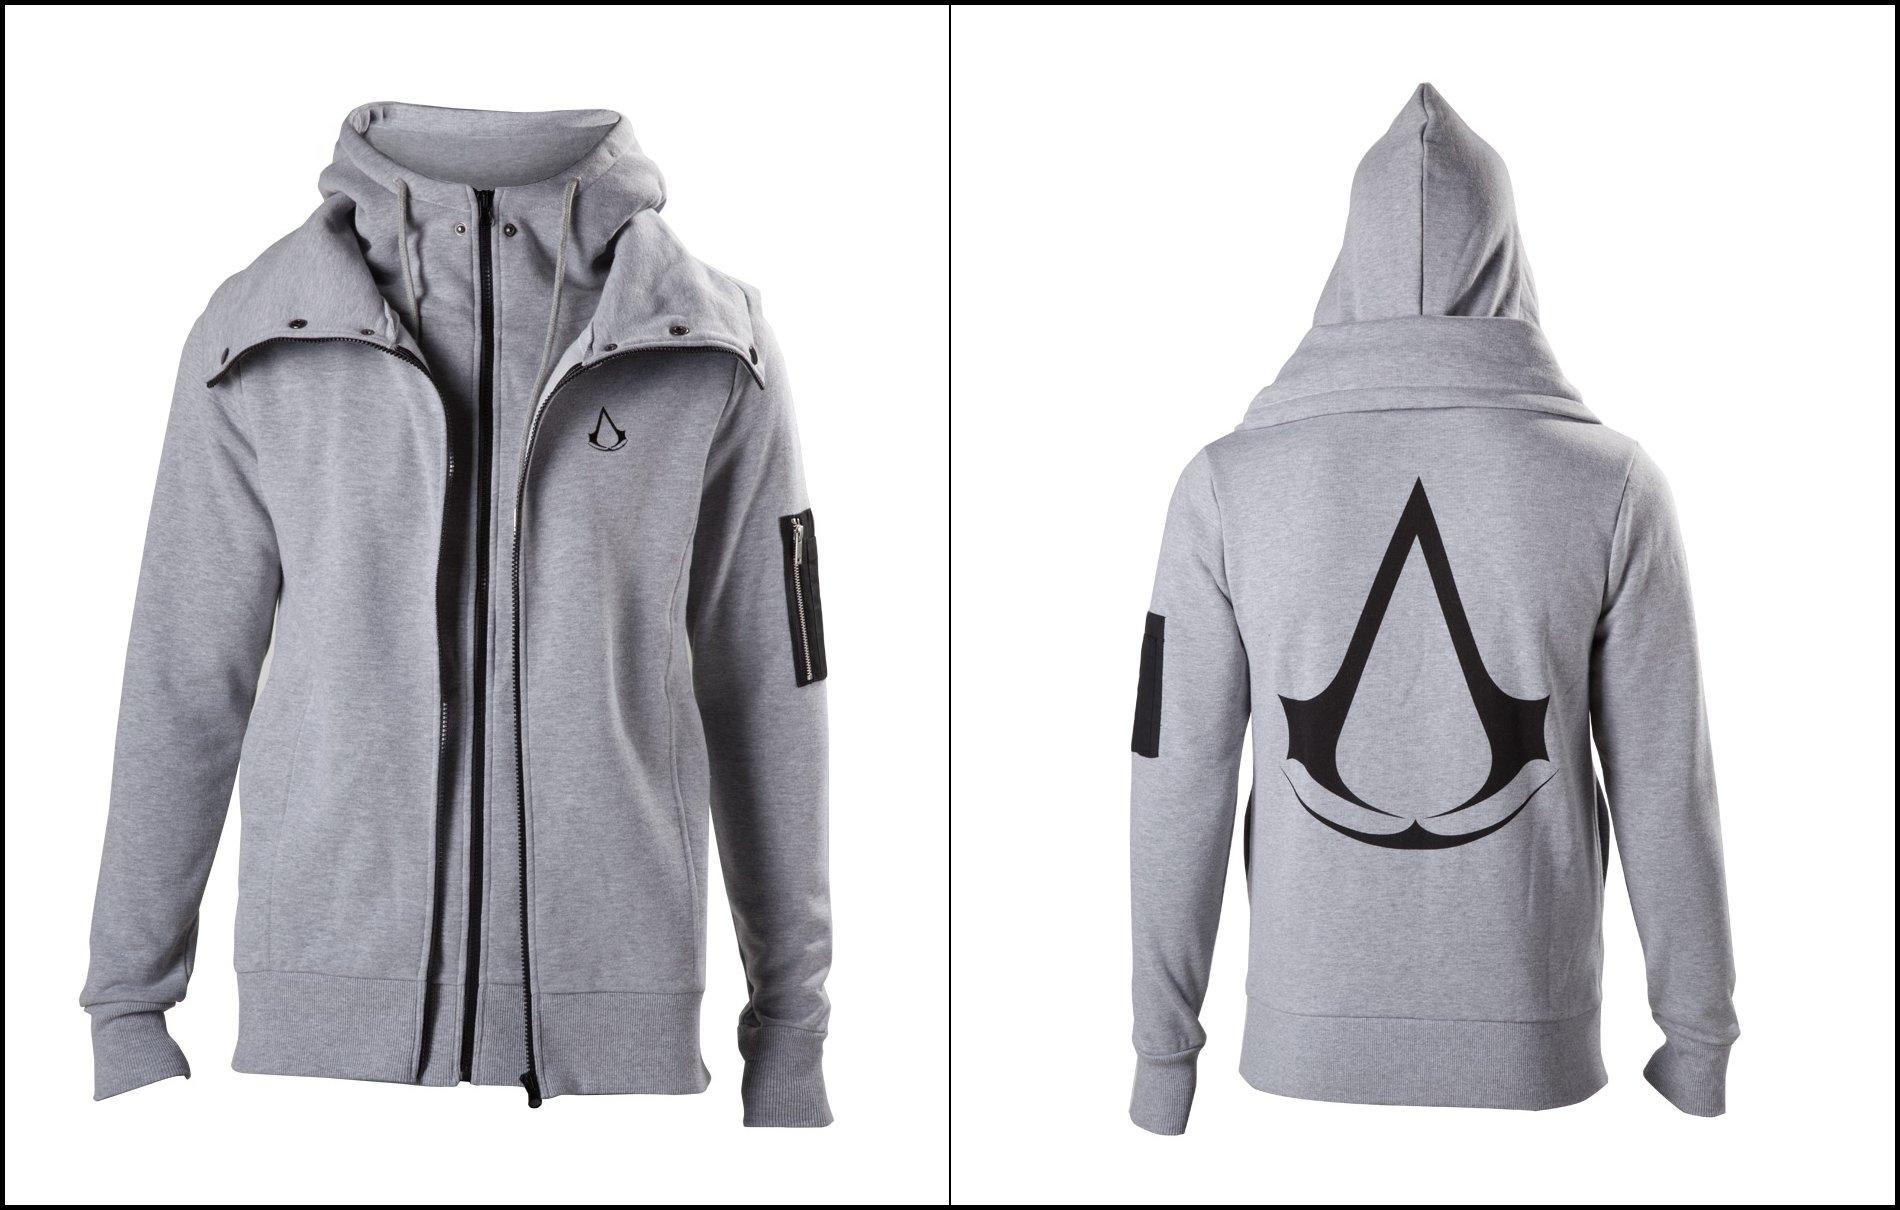 Originální šedá mikina s logem Assassins Creed a dvojitým zipem. c4fd69317b7